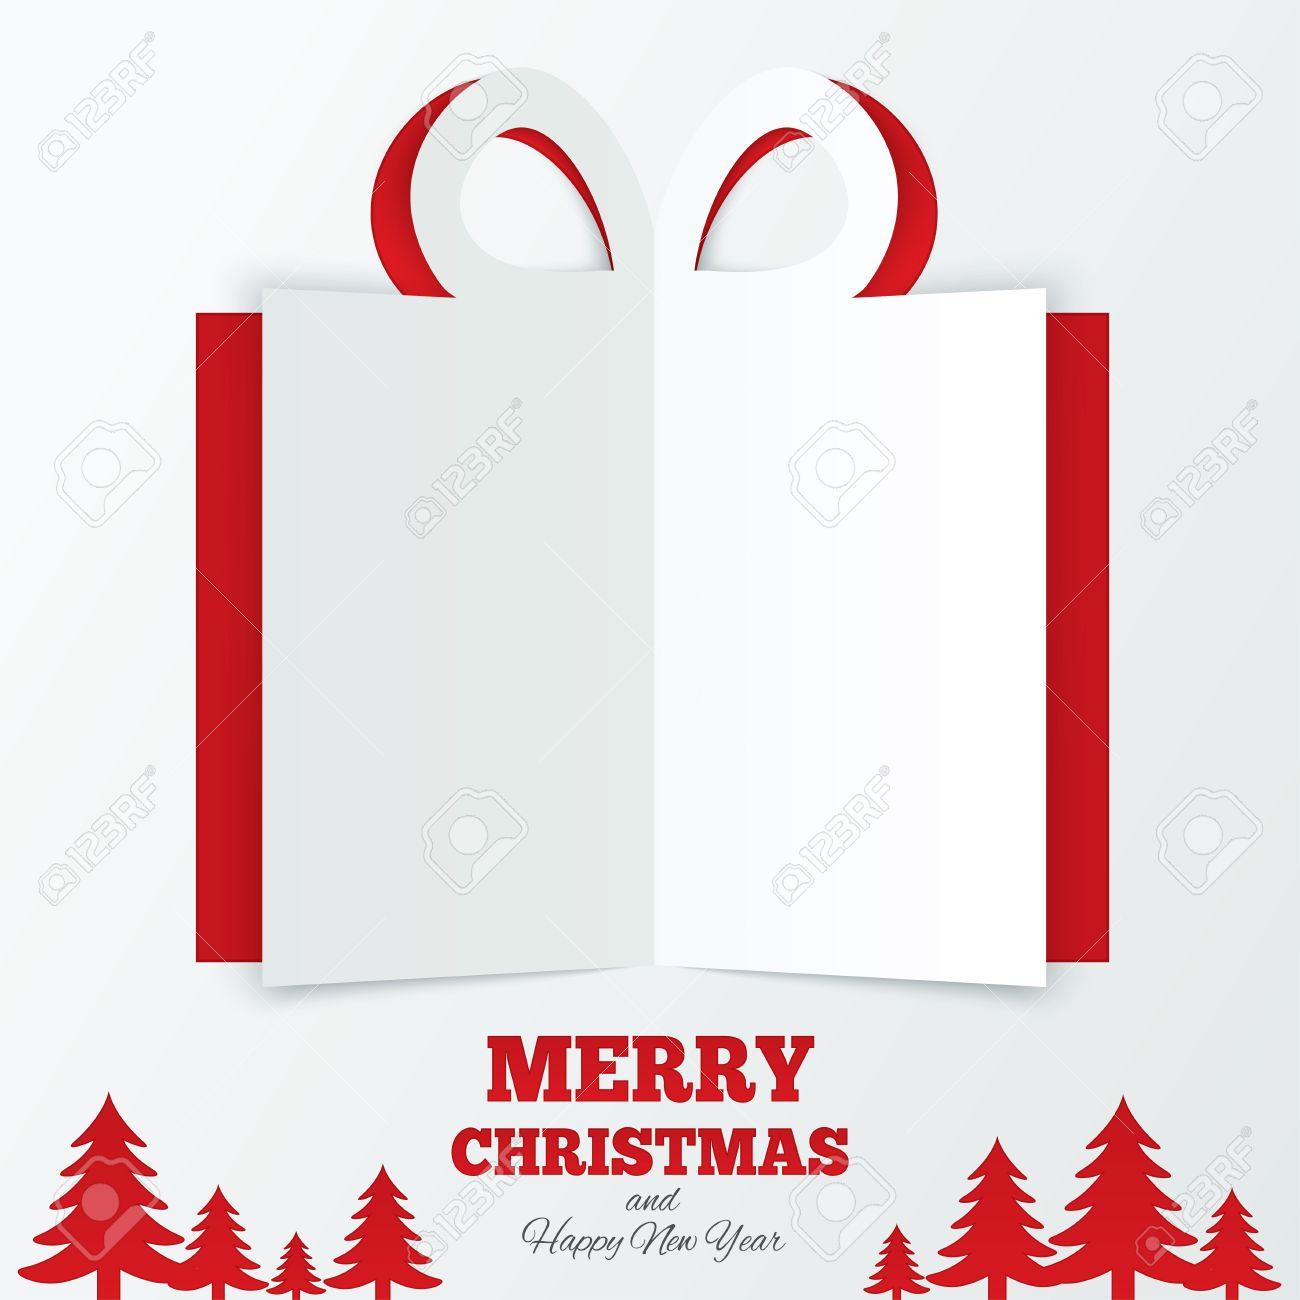 Christmas Tree Cutout.Christmas Box Cut The Paper Christmas Tree Cutout Paper Gift